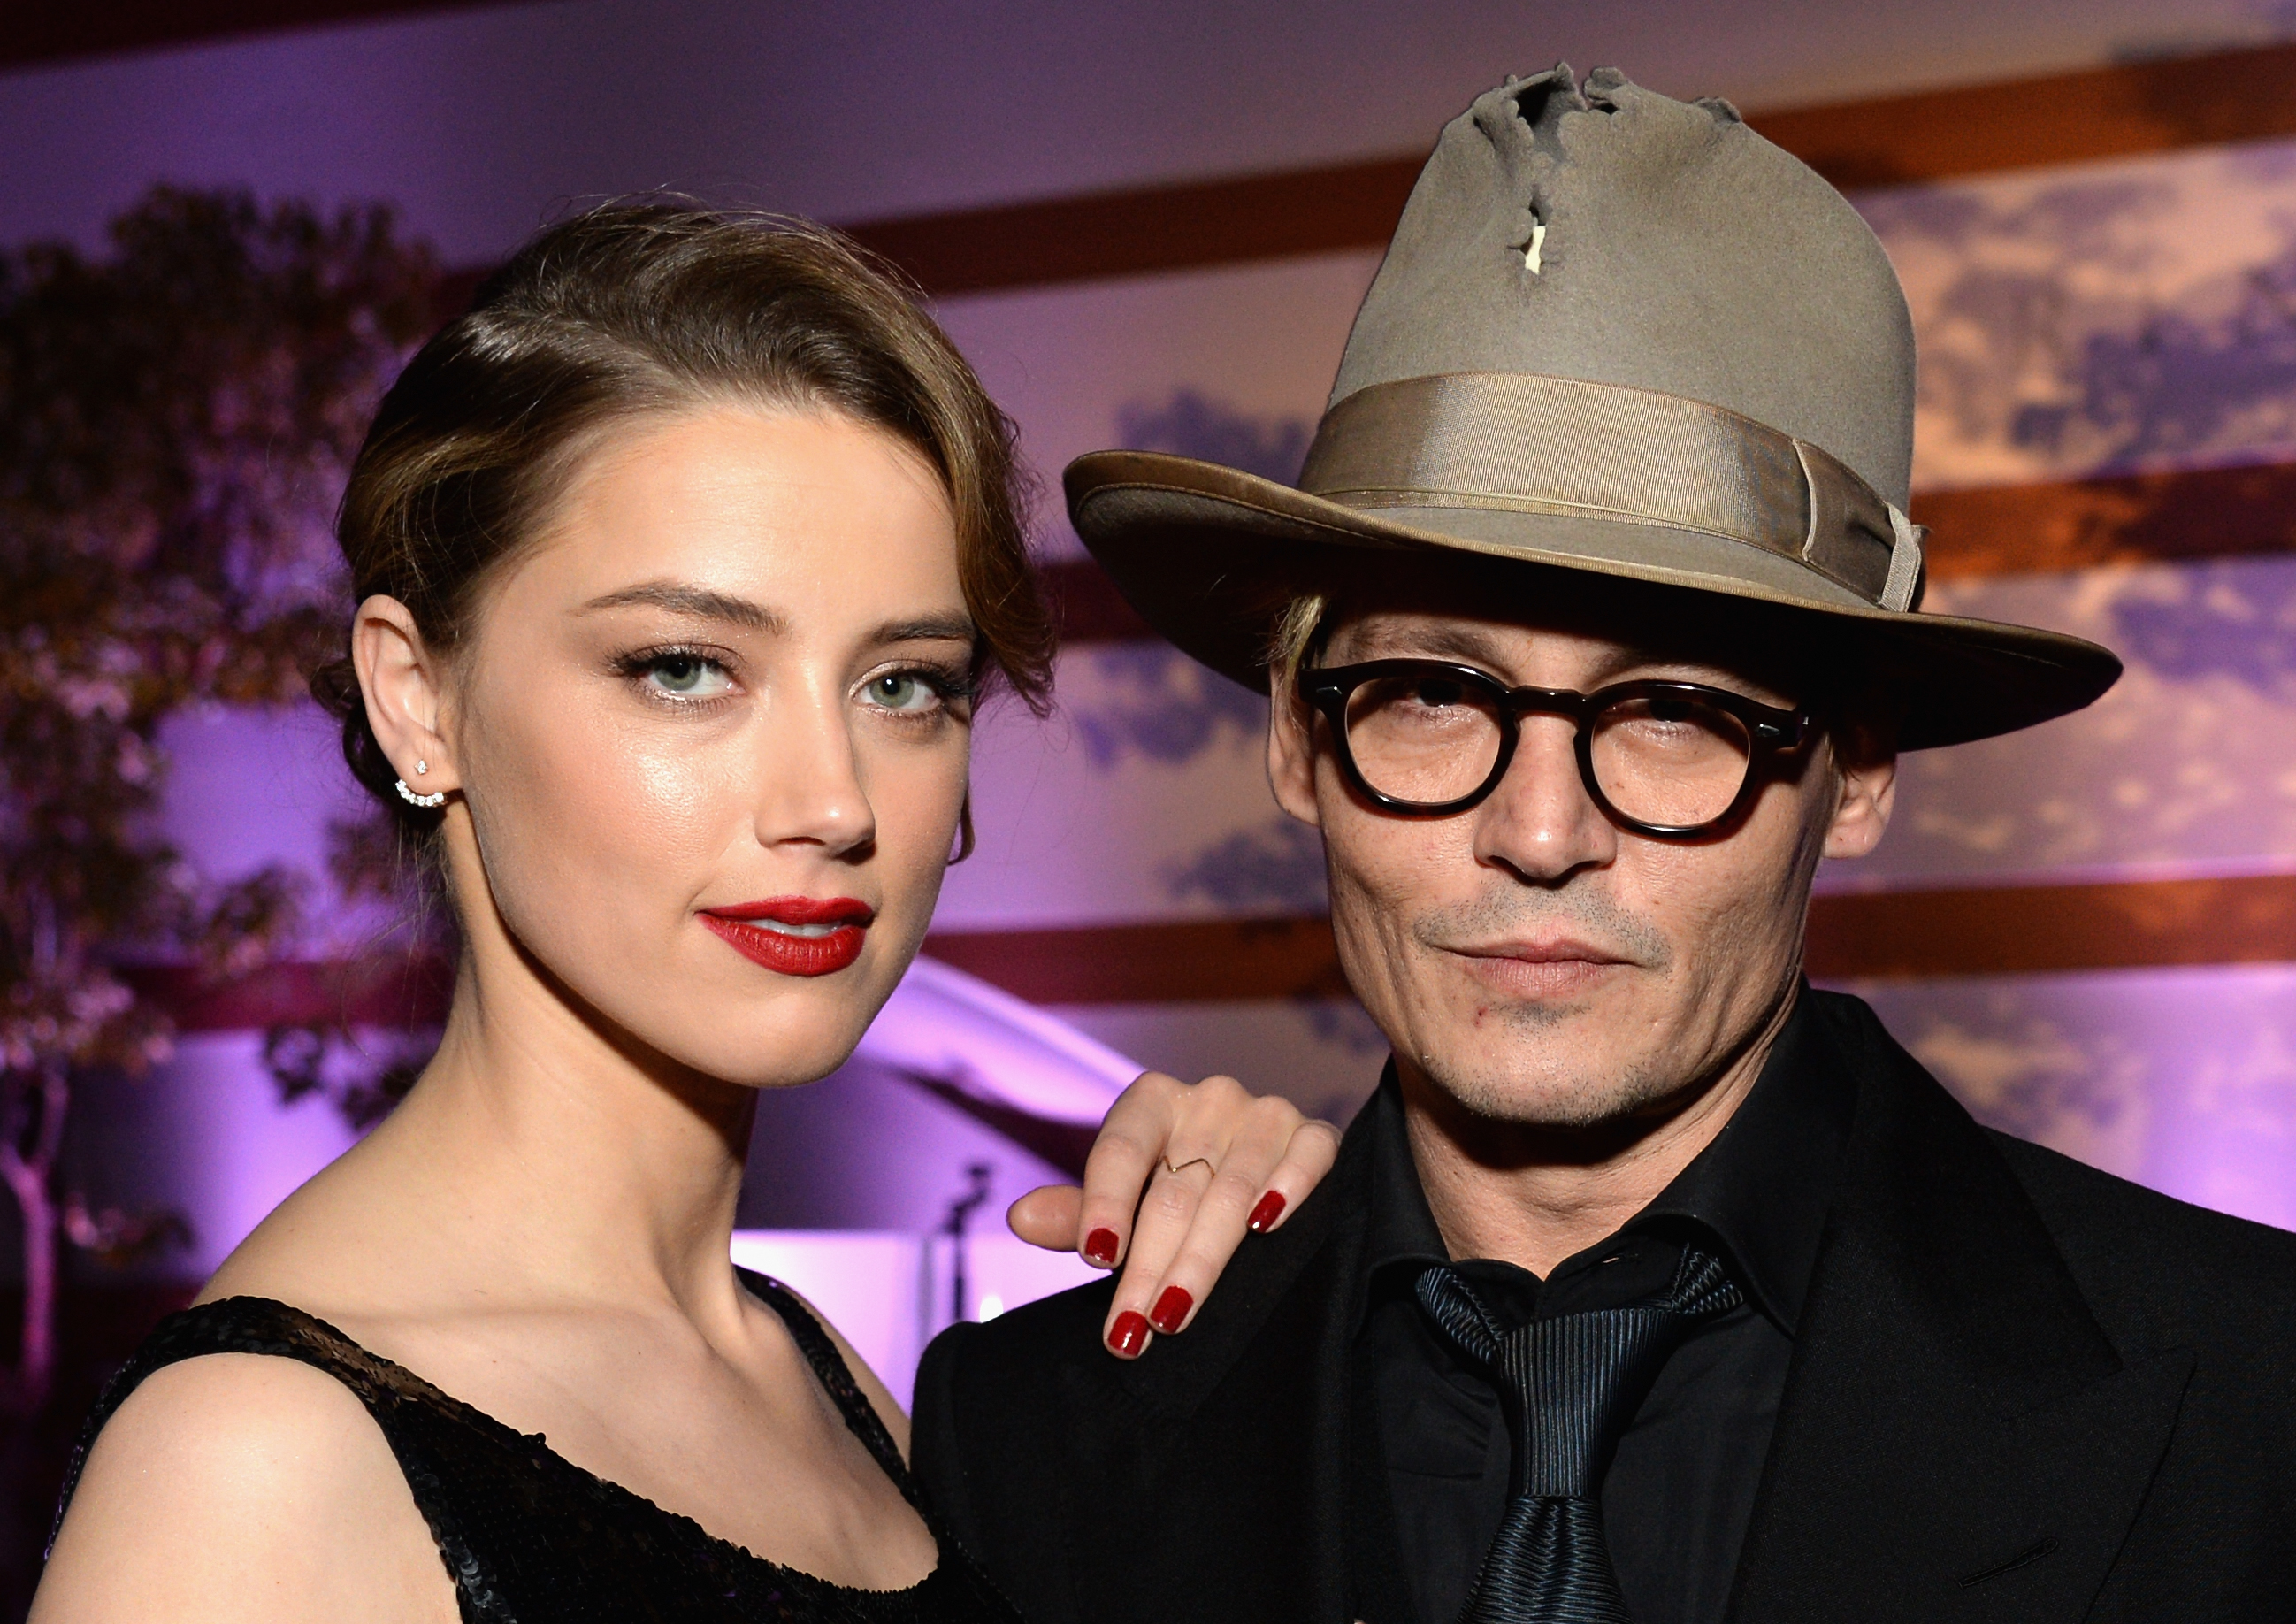 Amber Heard 'seeking £34,000 in monthly spousal support' from Johnny Depp